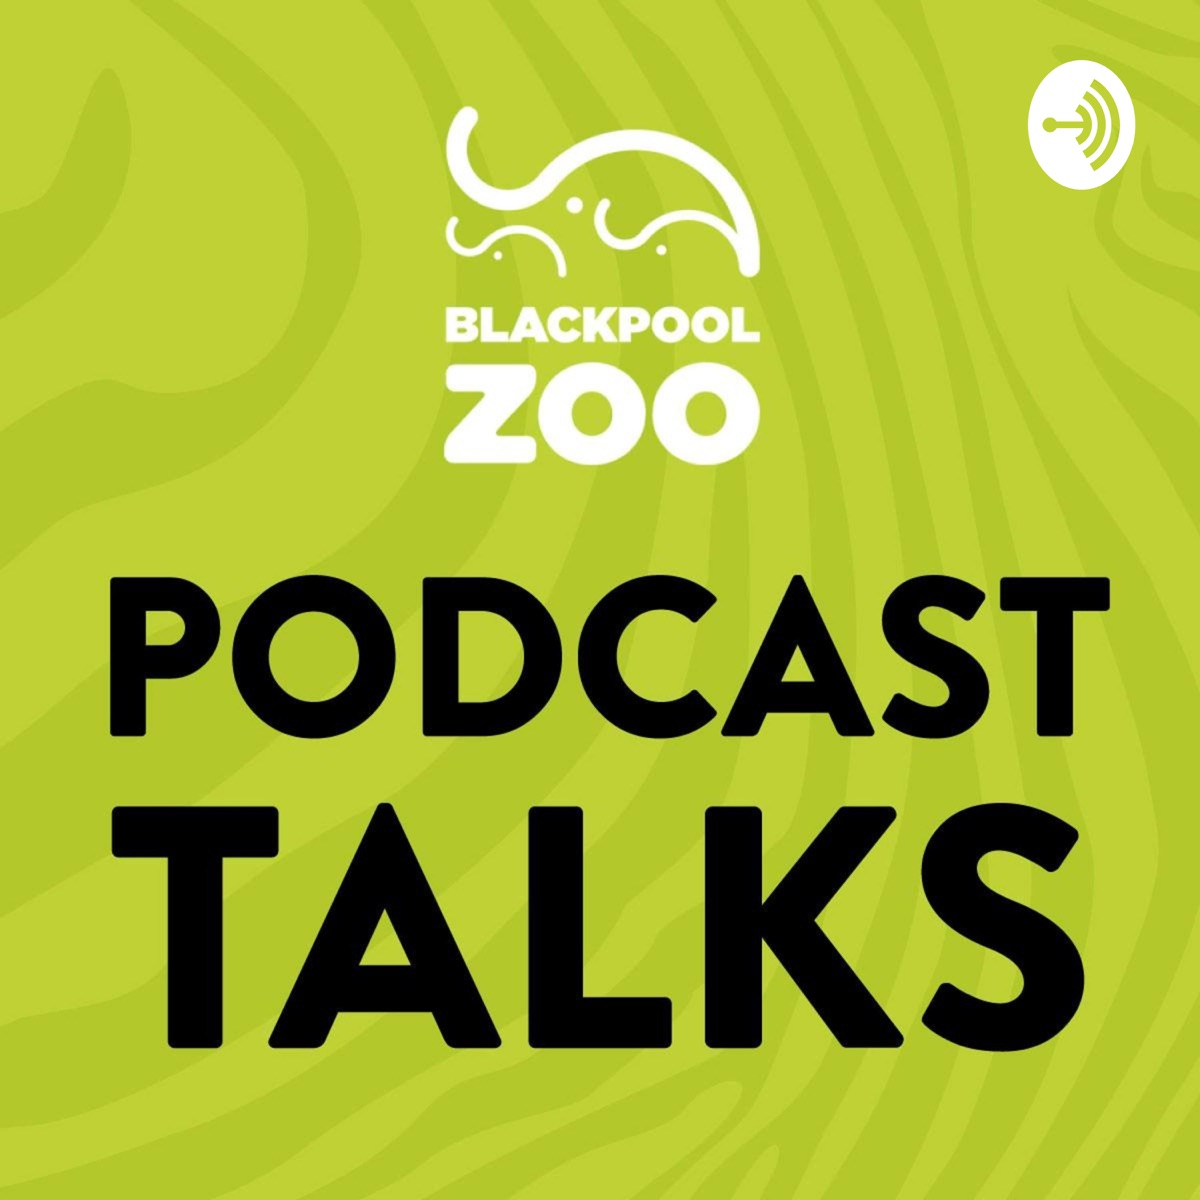 Podcast Talks at Blackpool Zoo